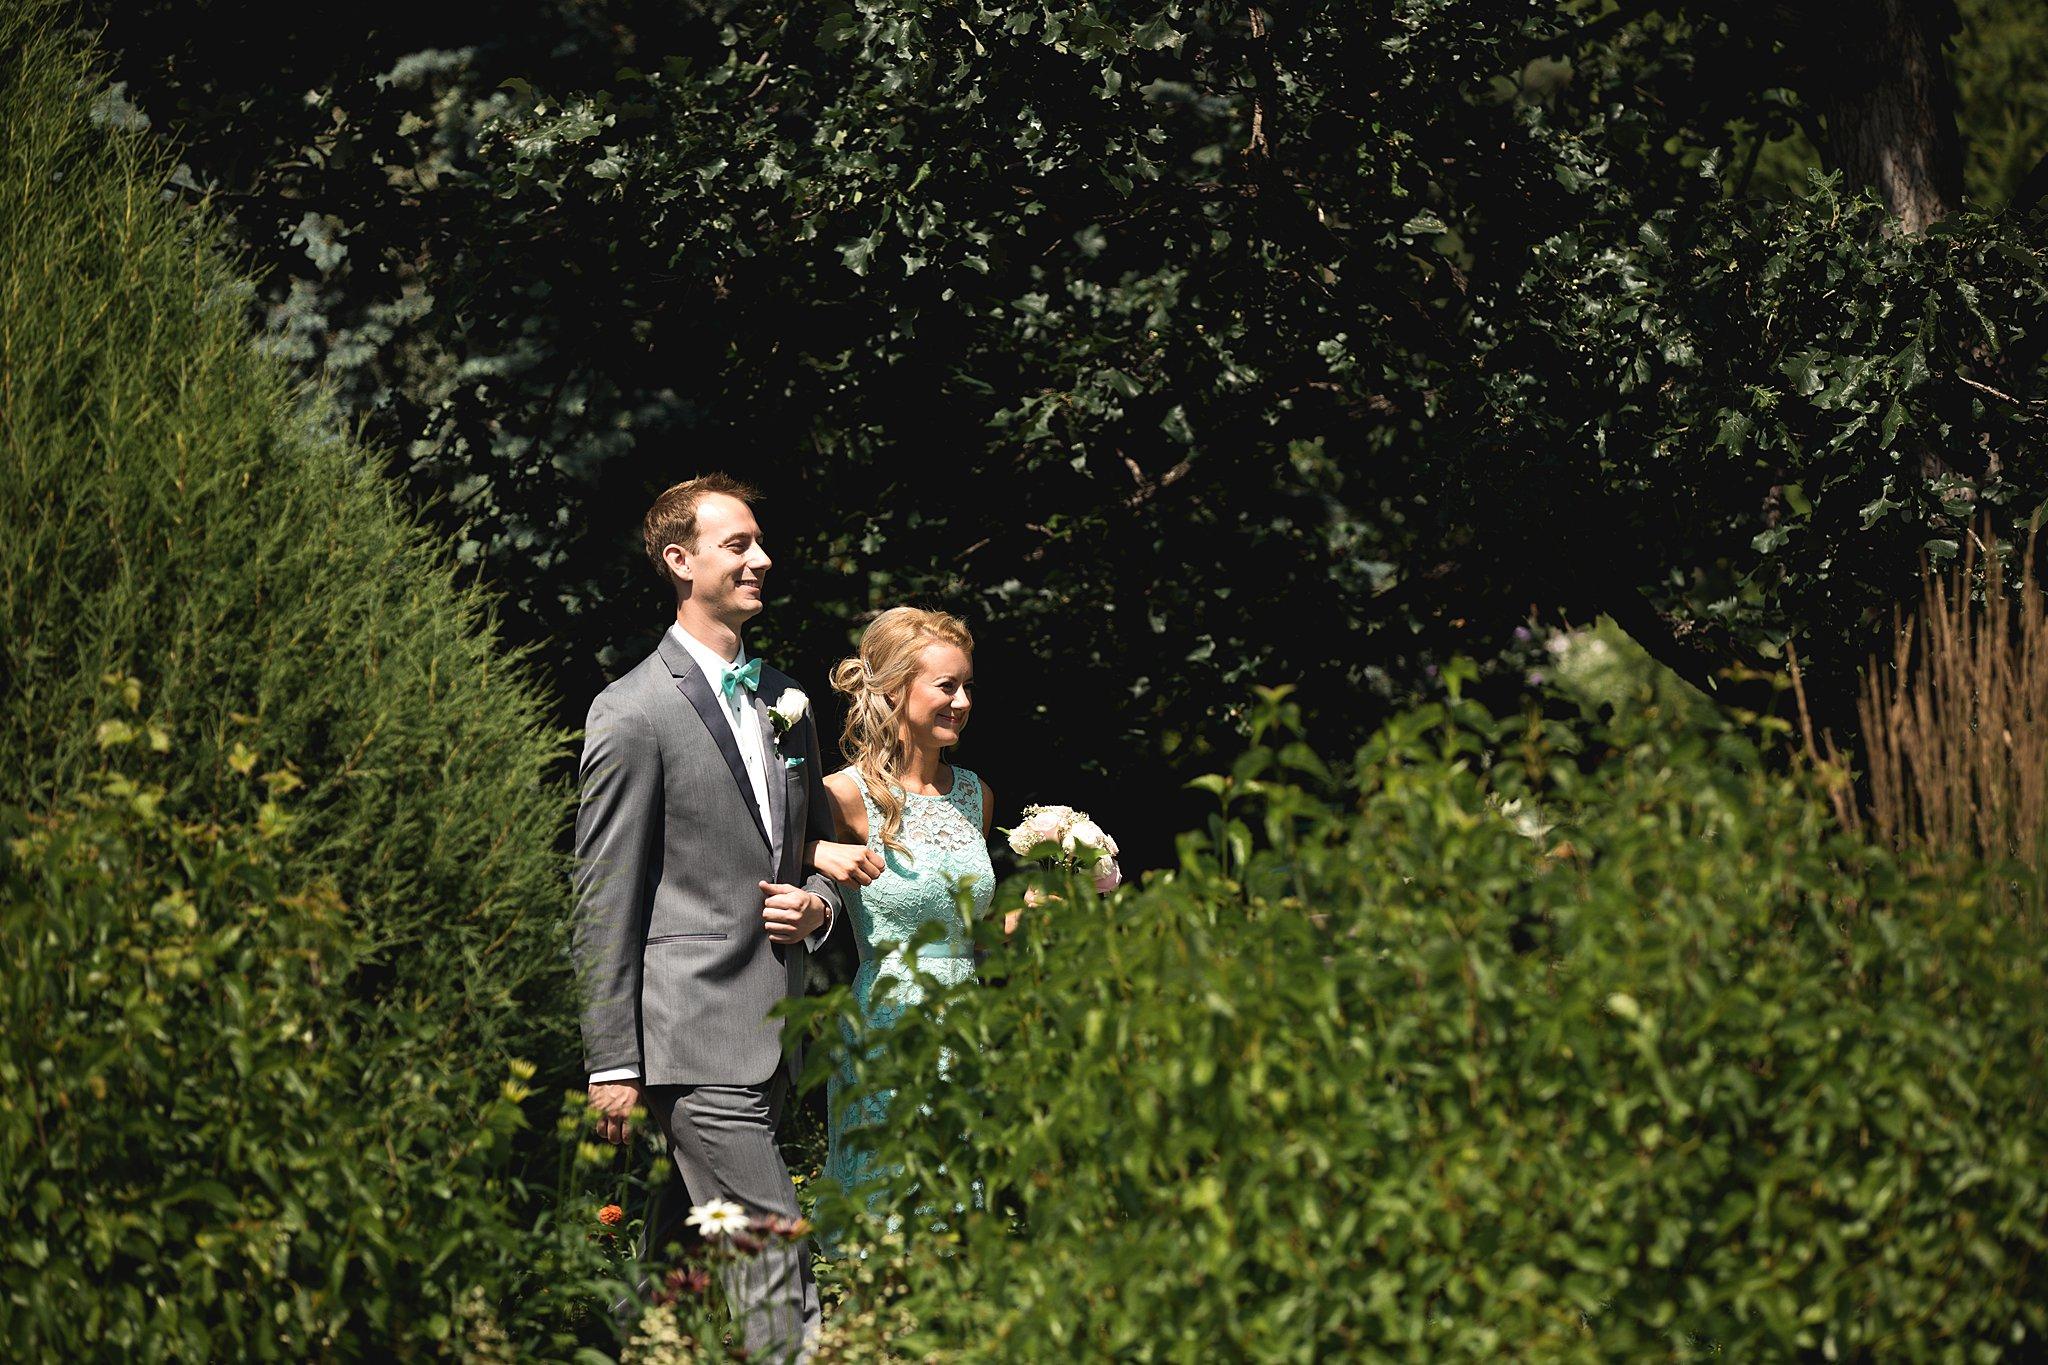 Ashley Daphne Photography Calgary Wedding Couple Family Photographer Calgary Zoo Summer Wedding Outdoor Ceremony_0050.jpg